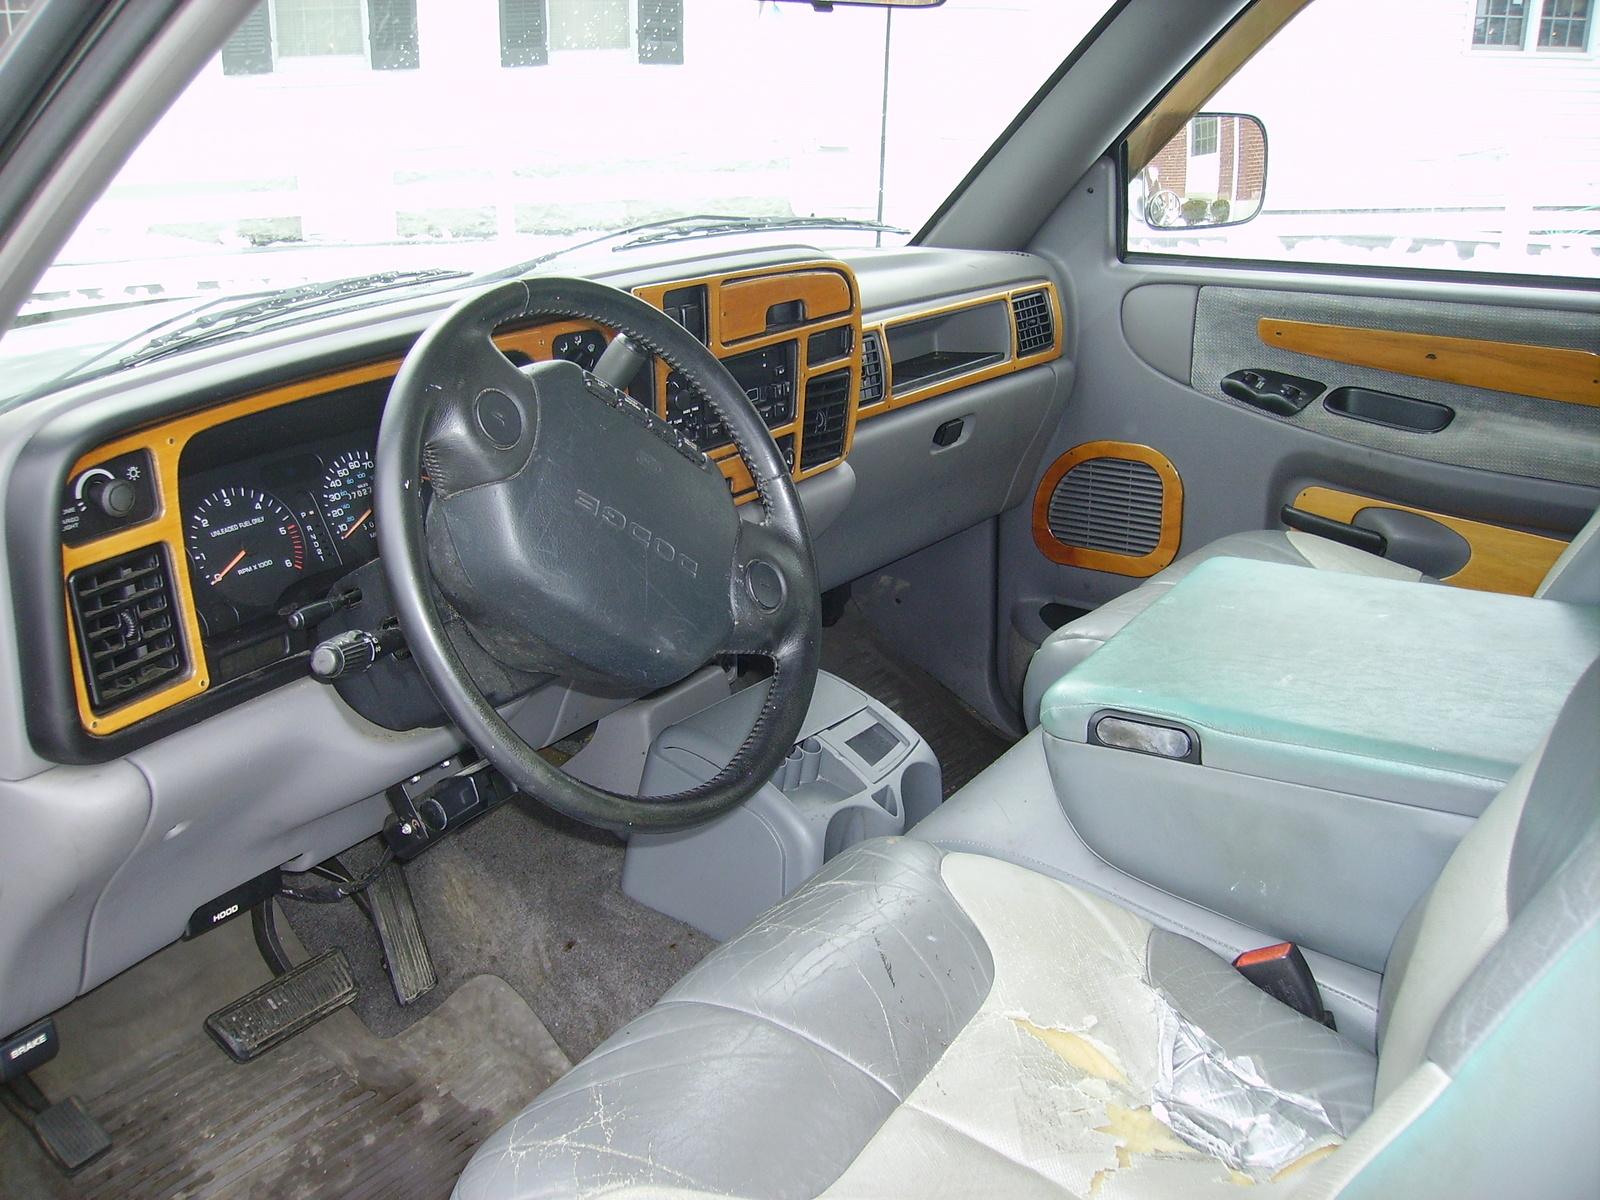 Dodge Ram Pickup Dr Laramie Slt Extended Cab Lb Pic on 1996 Dodge Dakota 4x4 Review